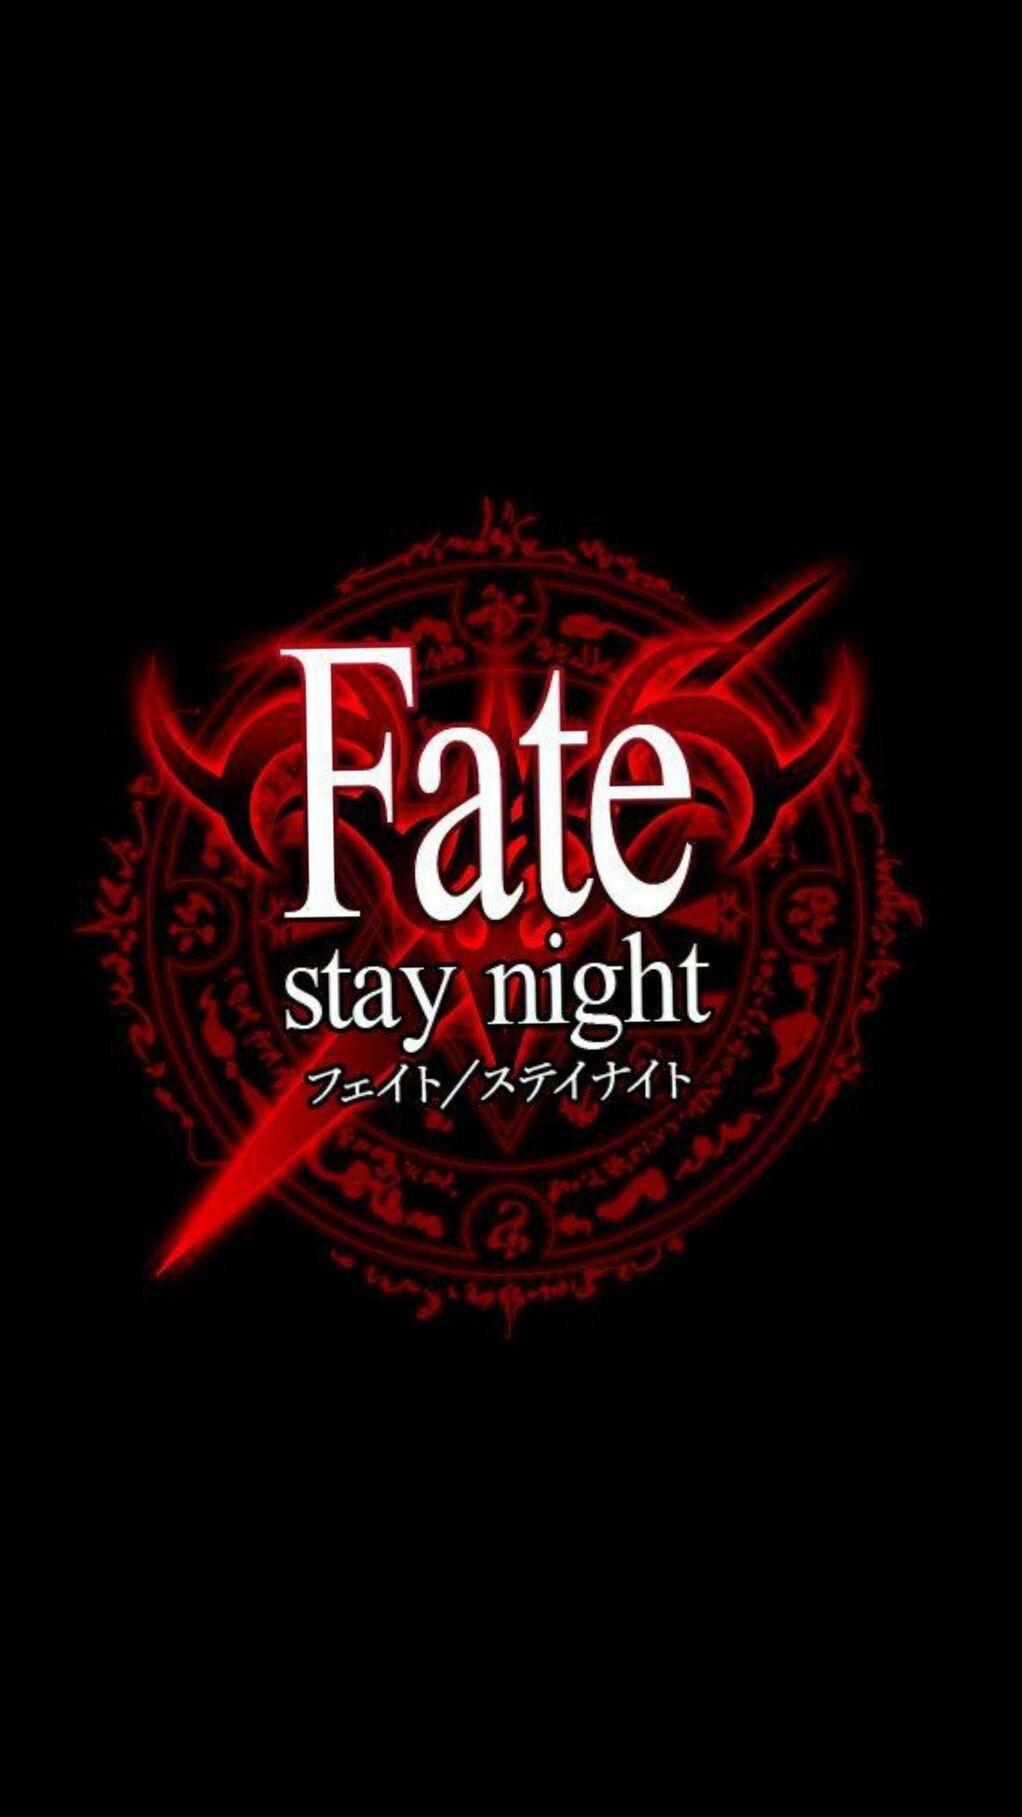 Fate Stay Night Logo Wallpaper Fate Stay Night Stay Night Fate